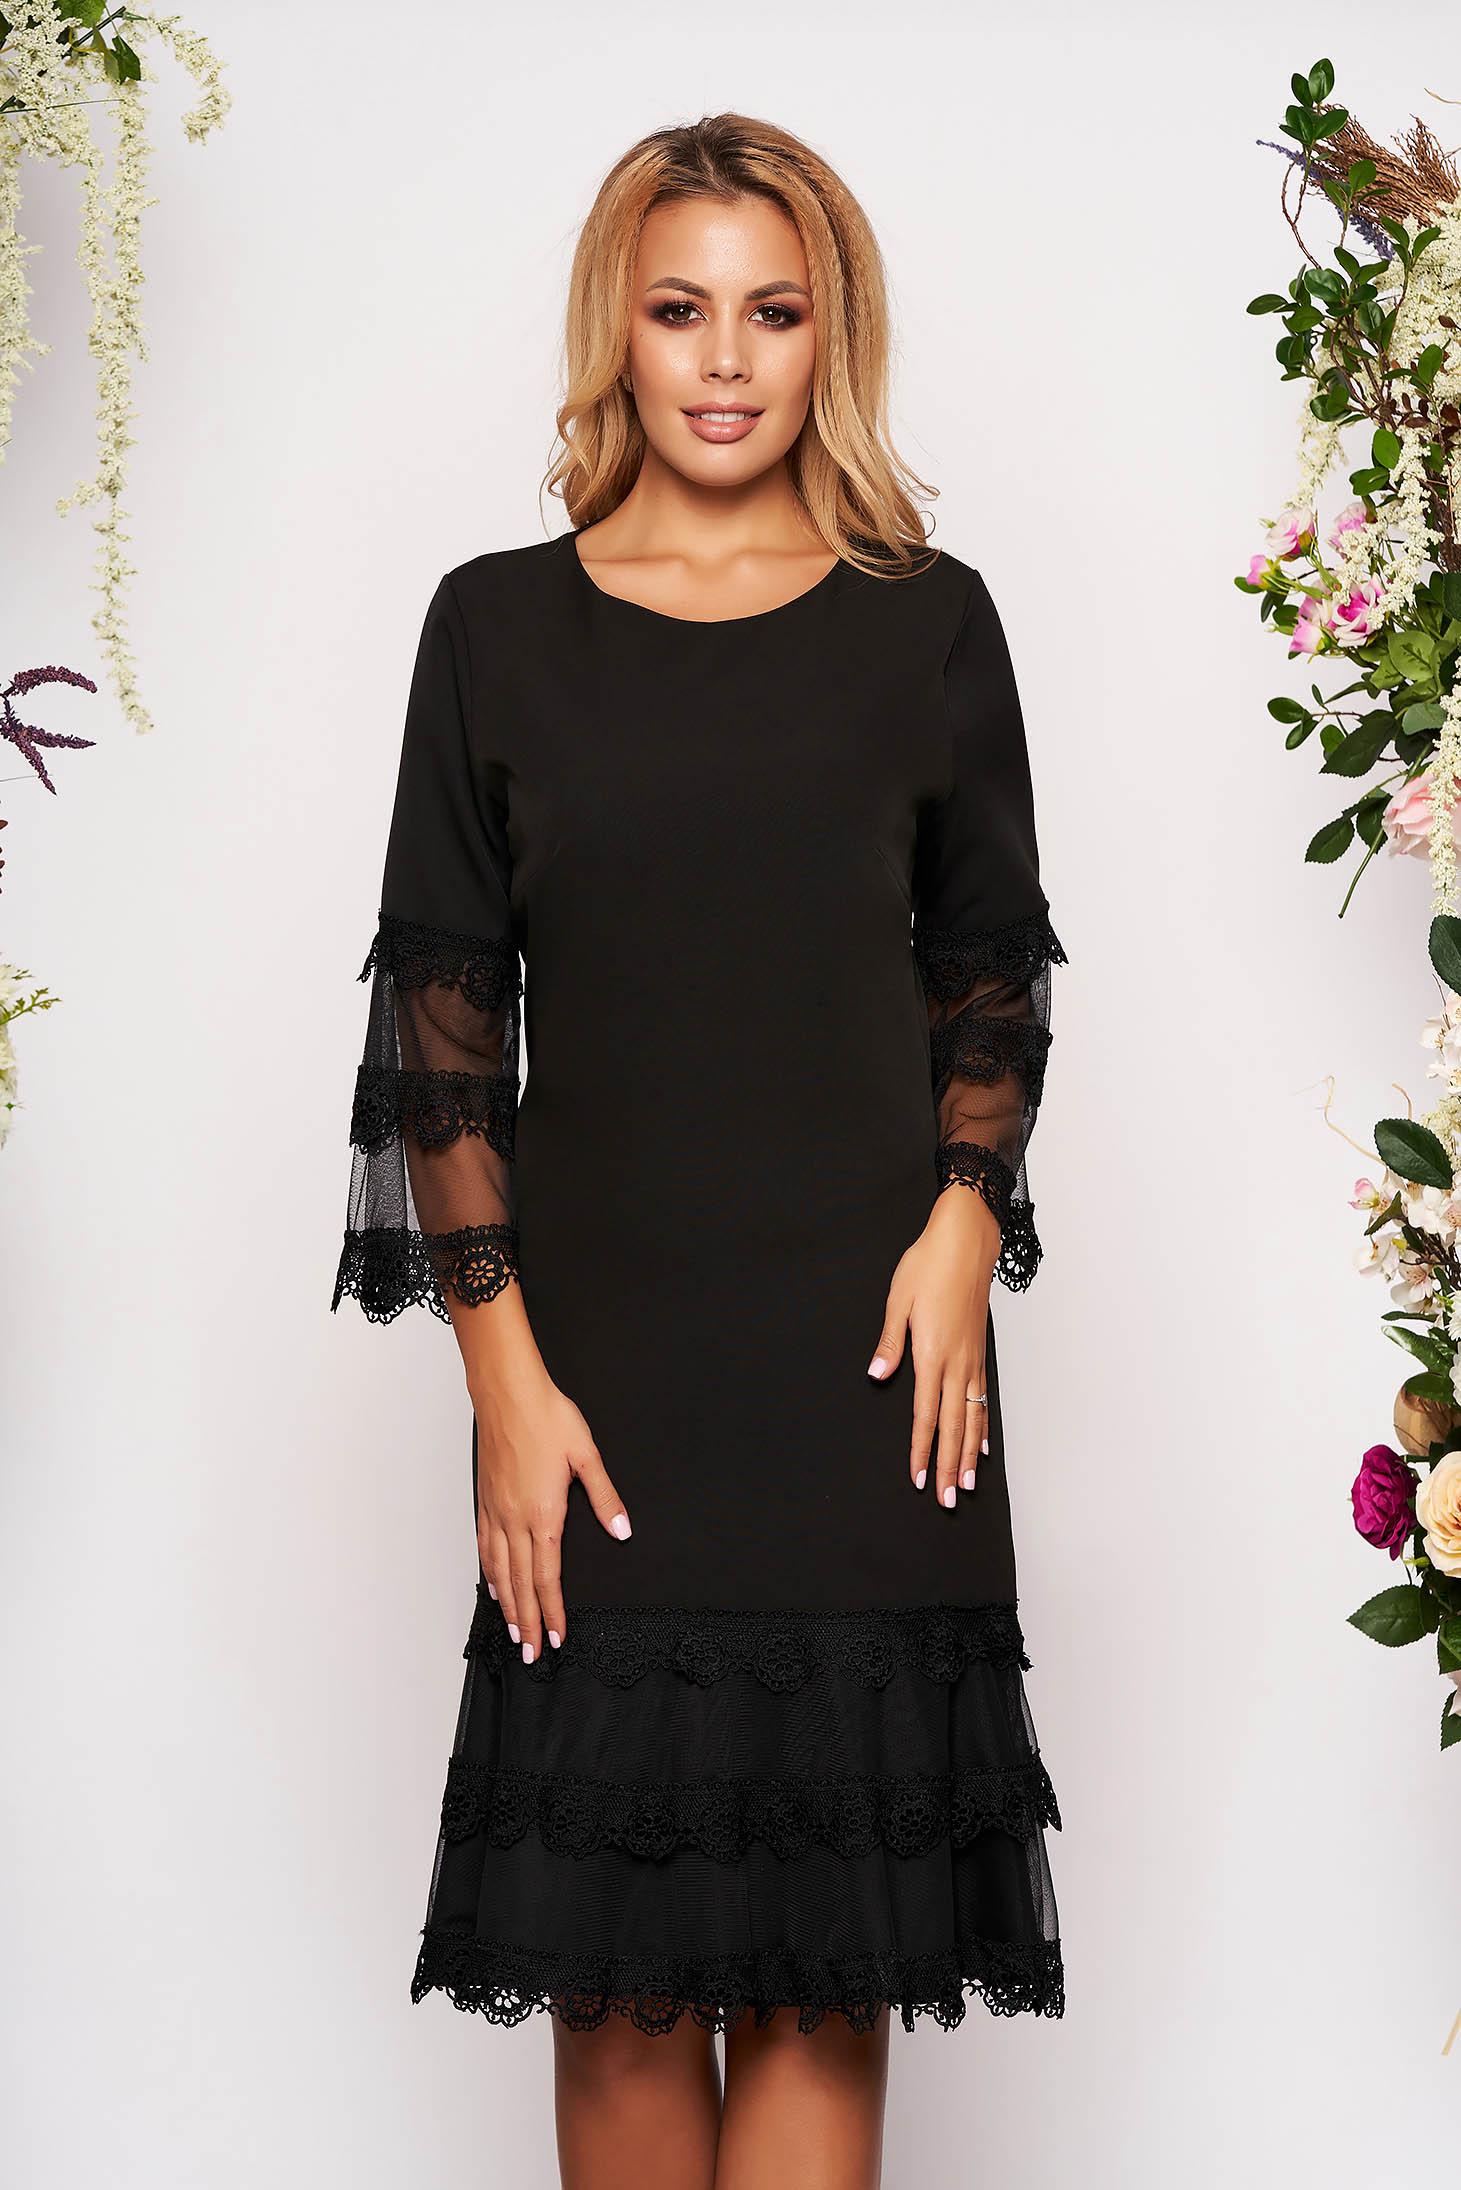 Rochie neagra midi eleganta cu croi in a din stofa cu maneci trei-sferturi tip clopot captusita pe interior